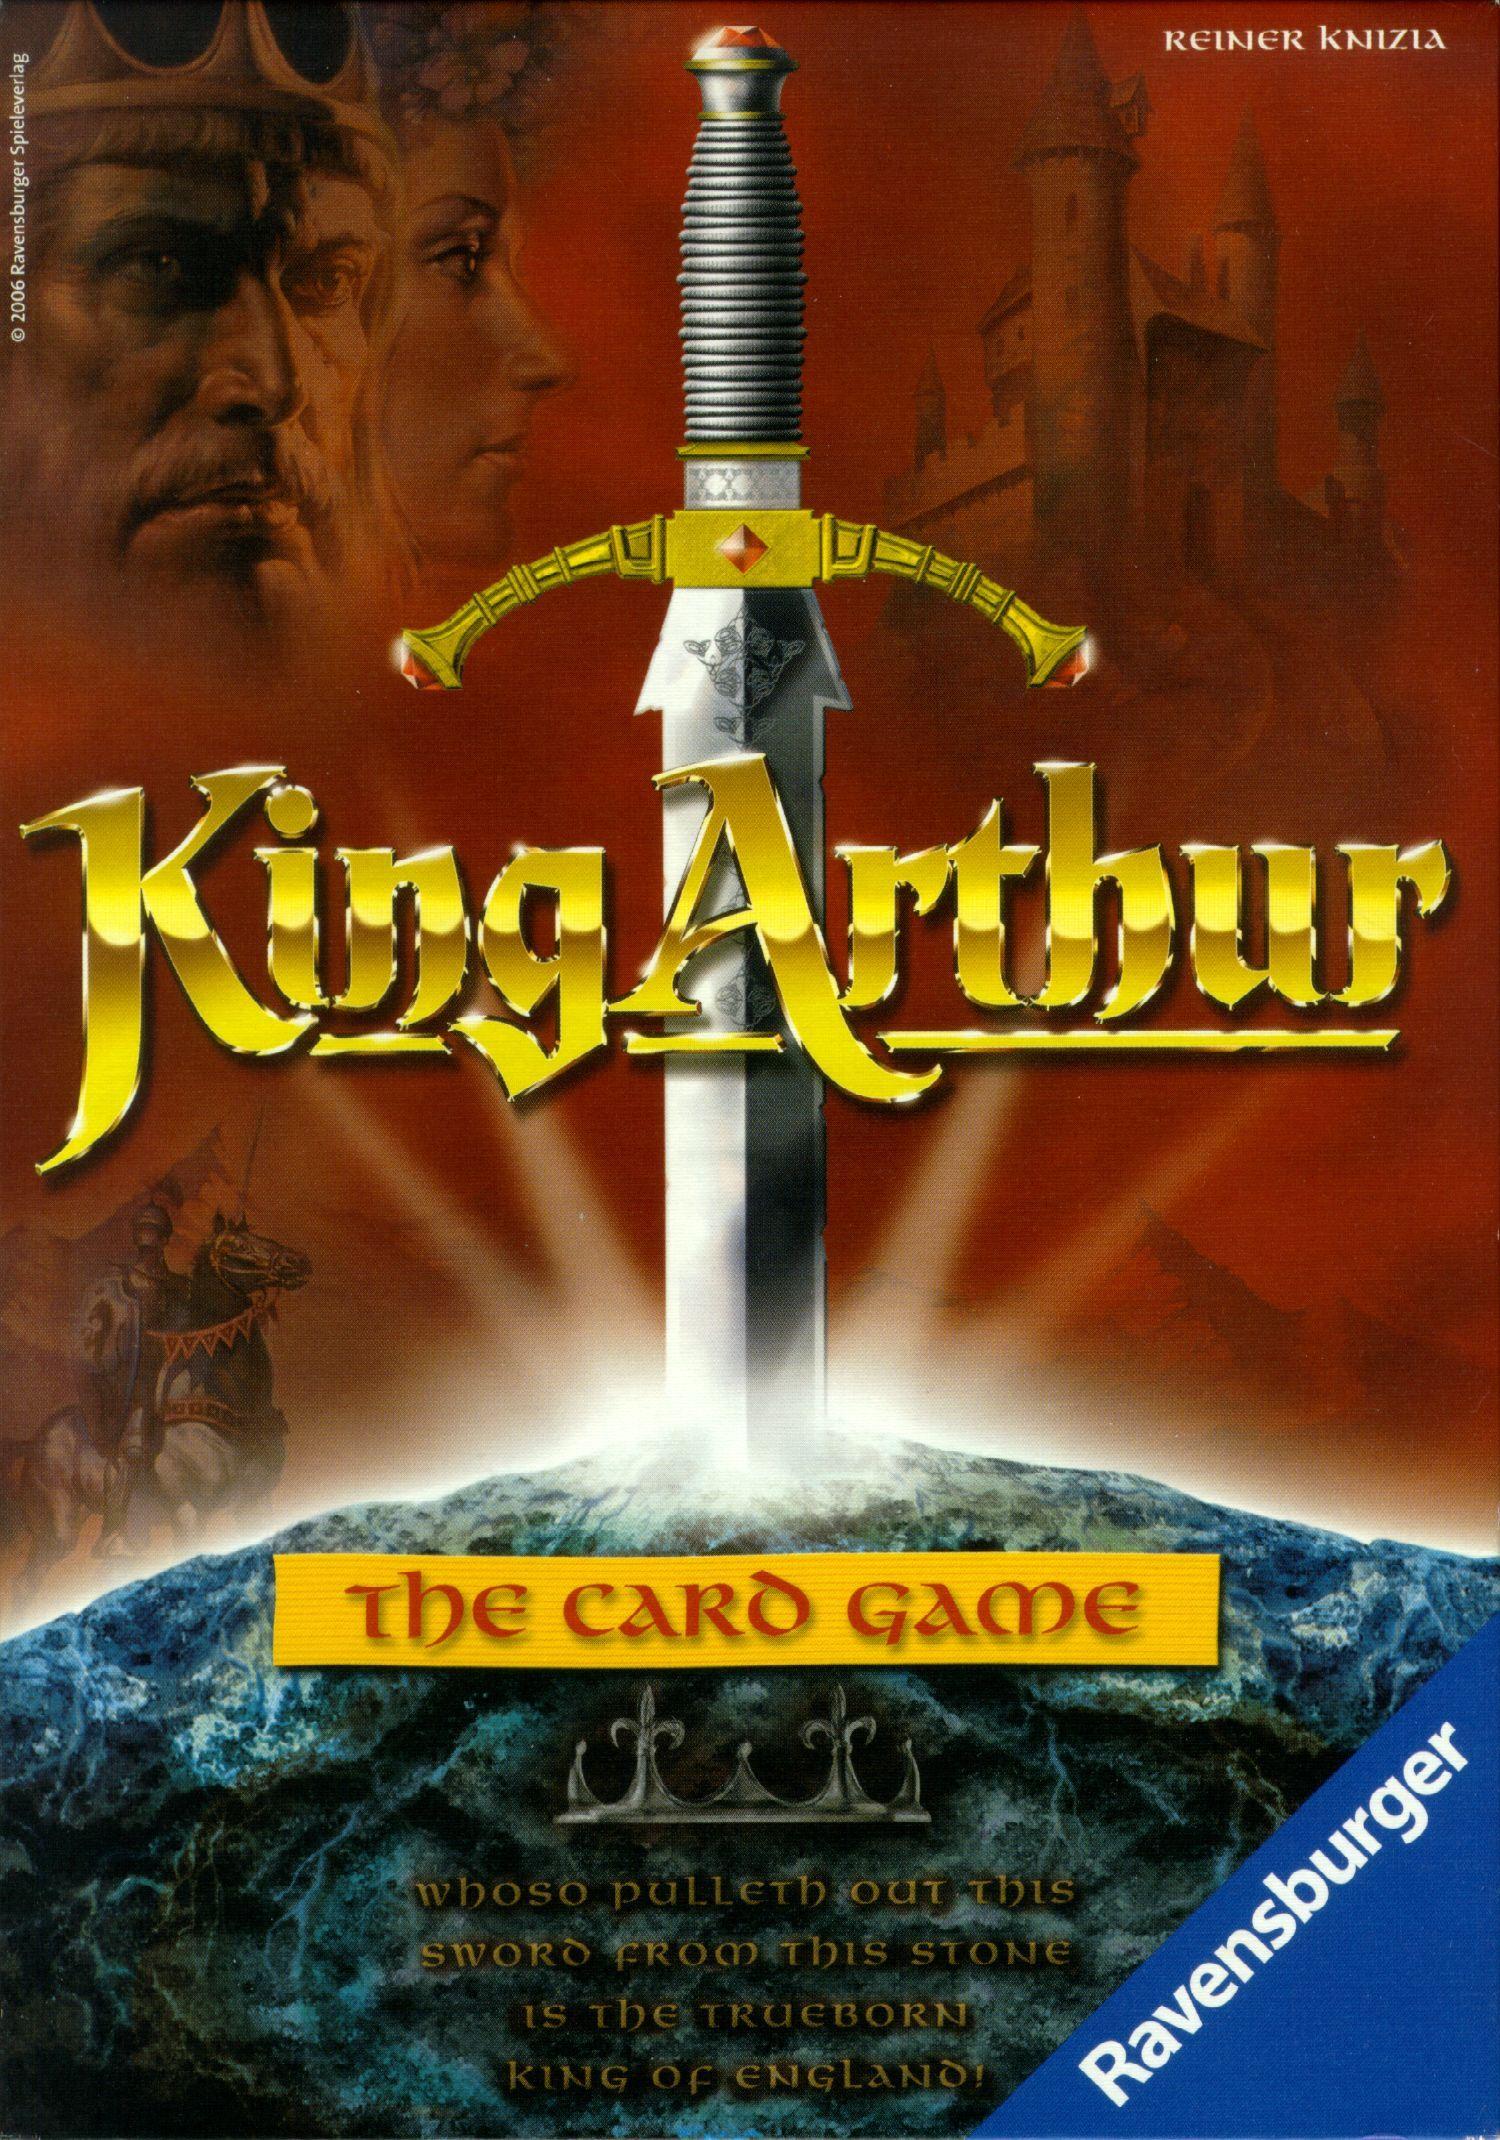 King Arthur: The Card Game